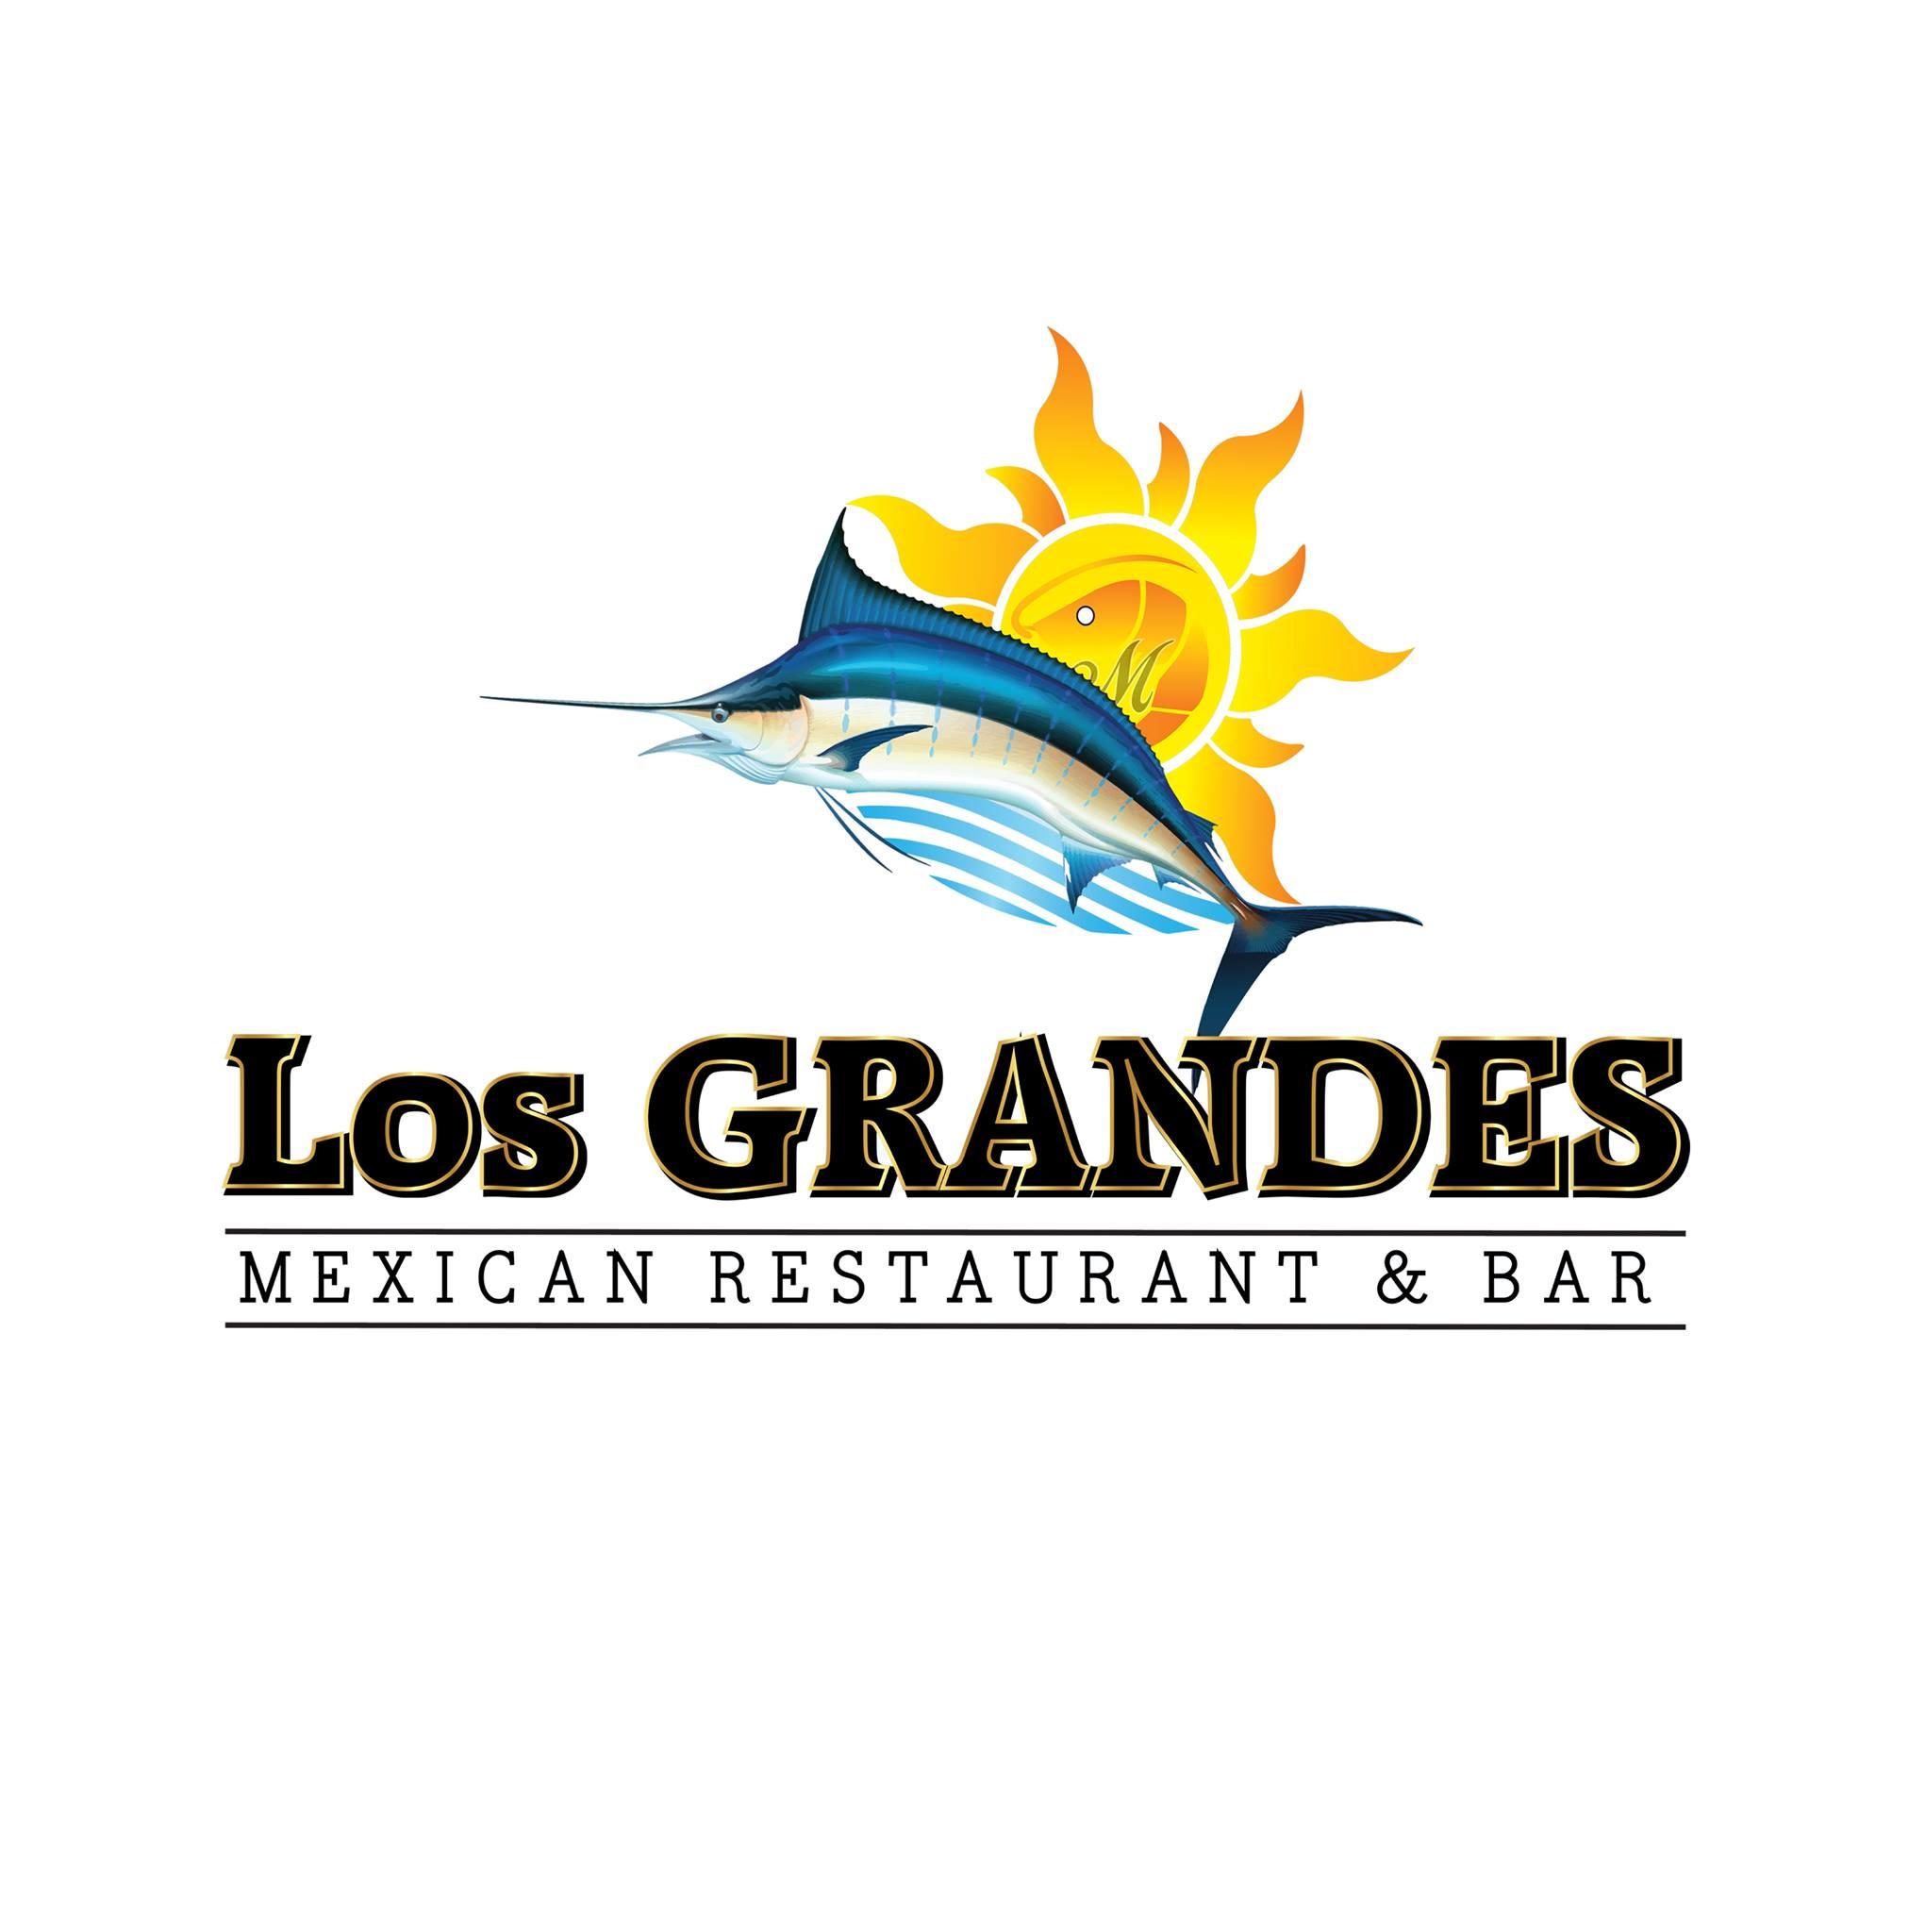 Los Grandes Mexican Restaurant & Bar